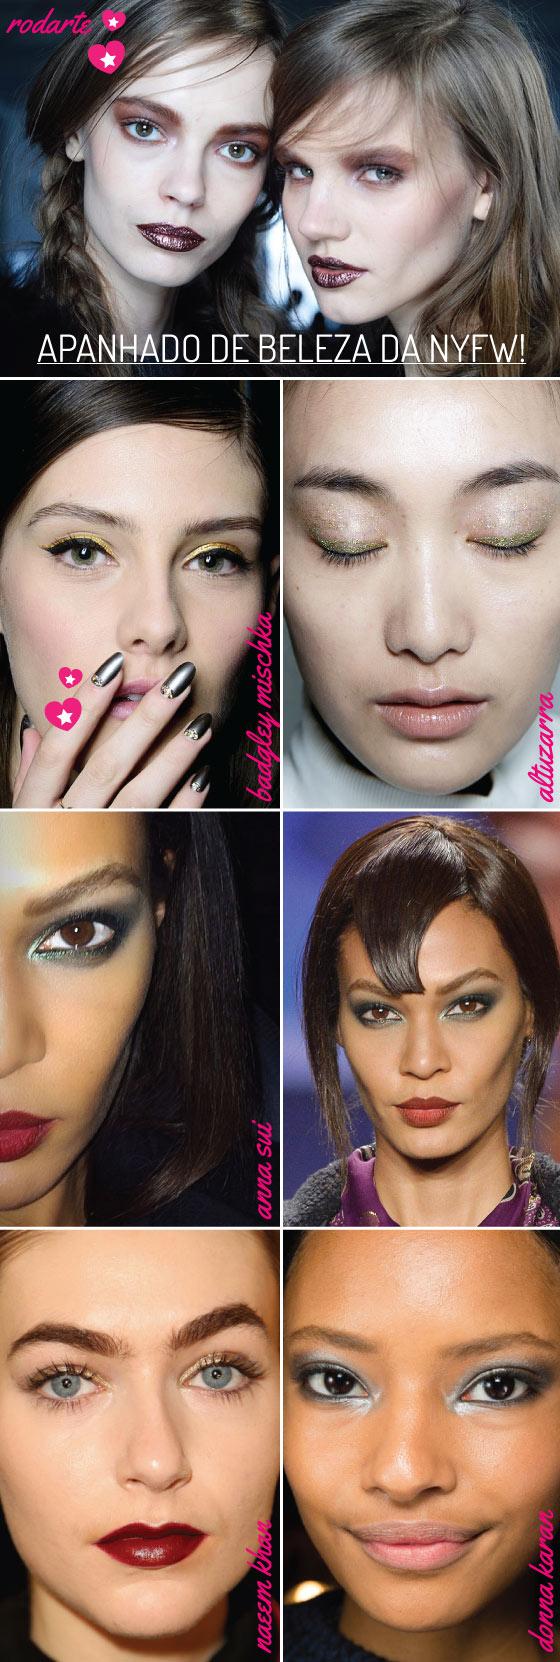 beleza-nyfw-new-york-make-makeup-desfiles-maquiagem